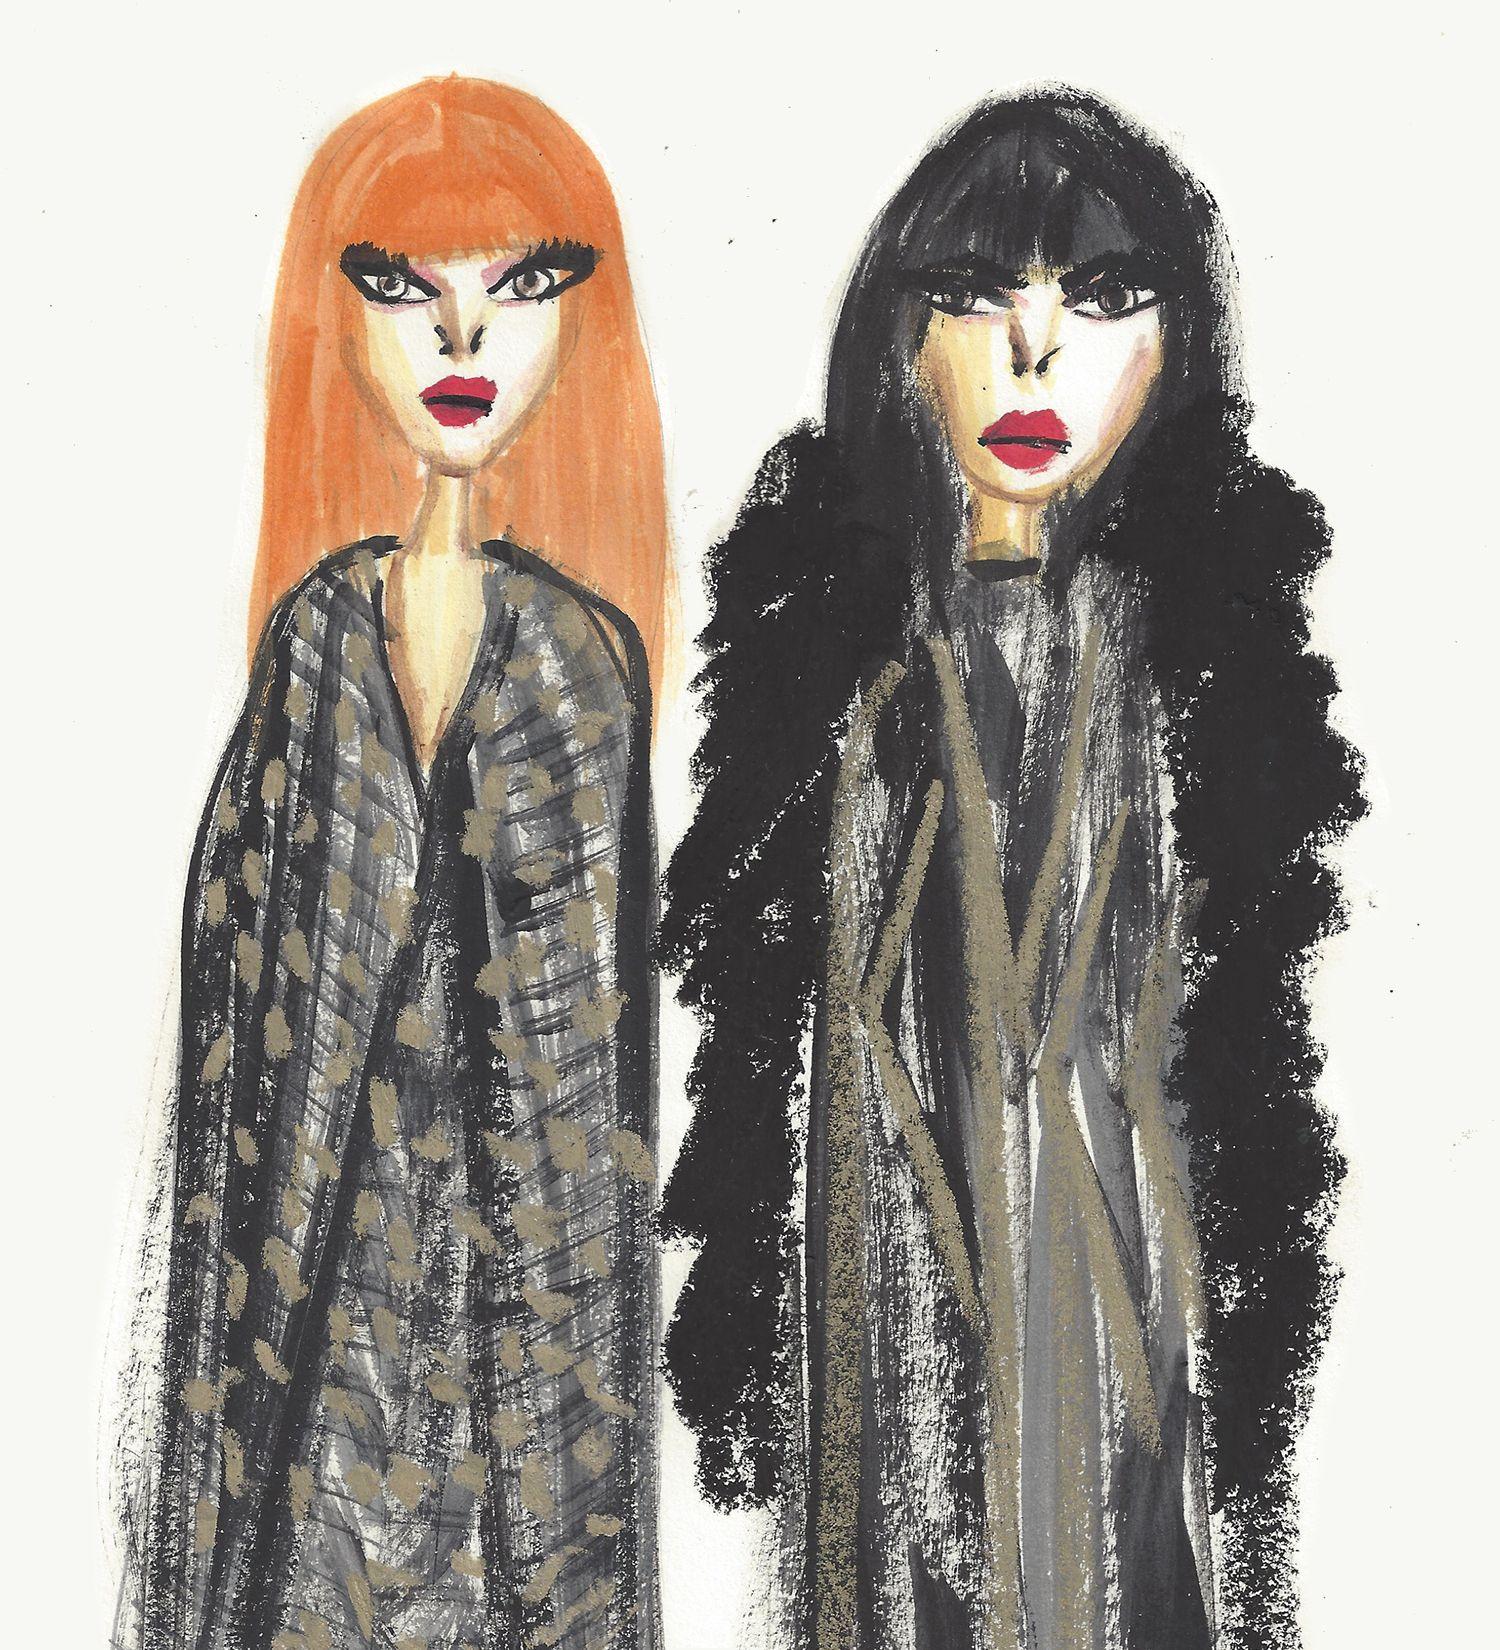 Givenchy Couture 2016 @jessrielle fashion illustration